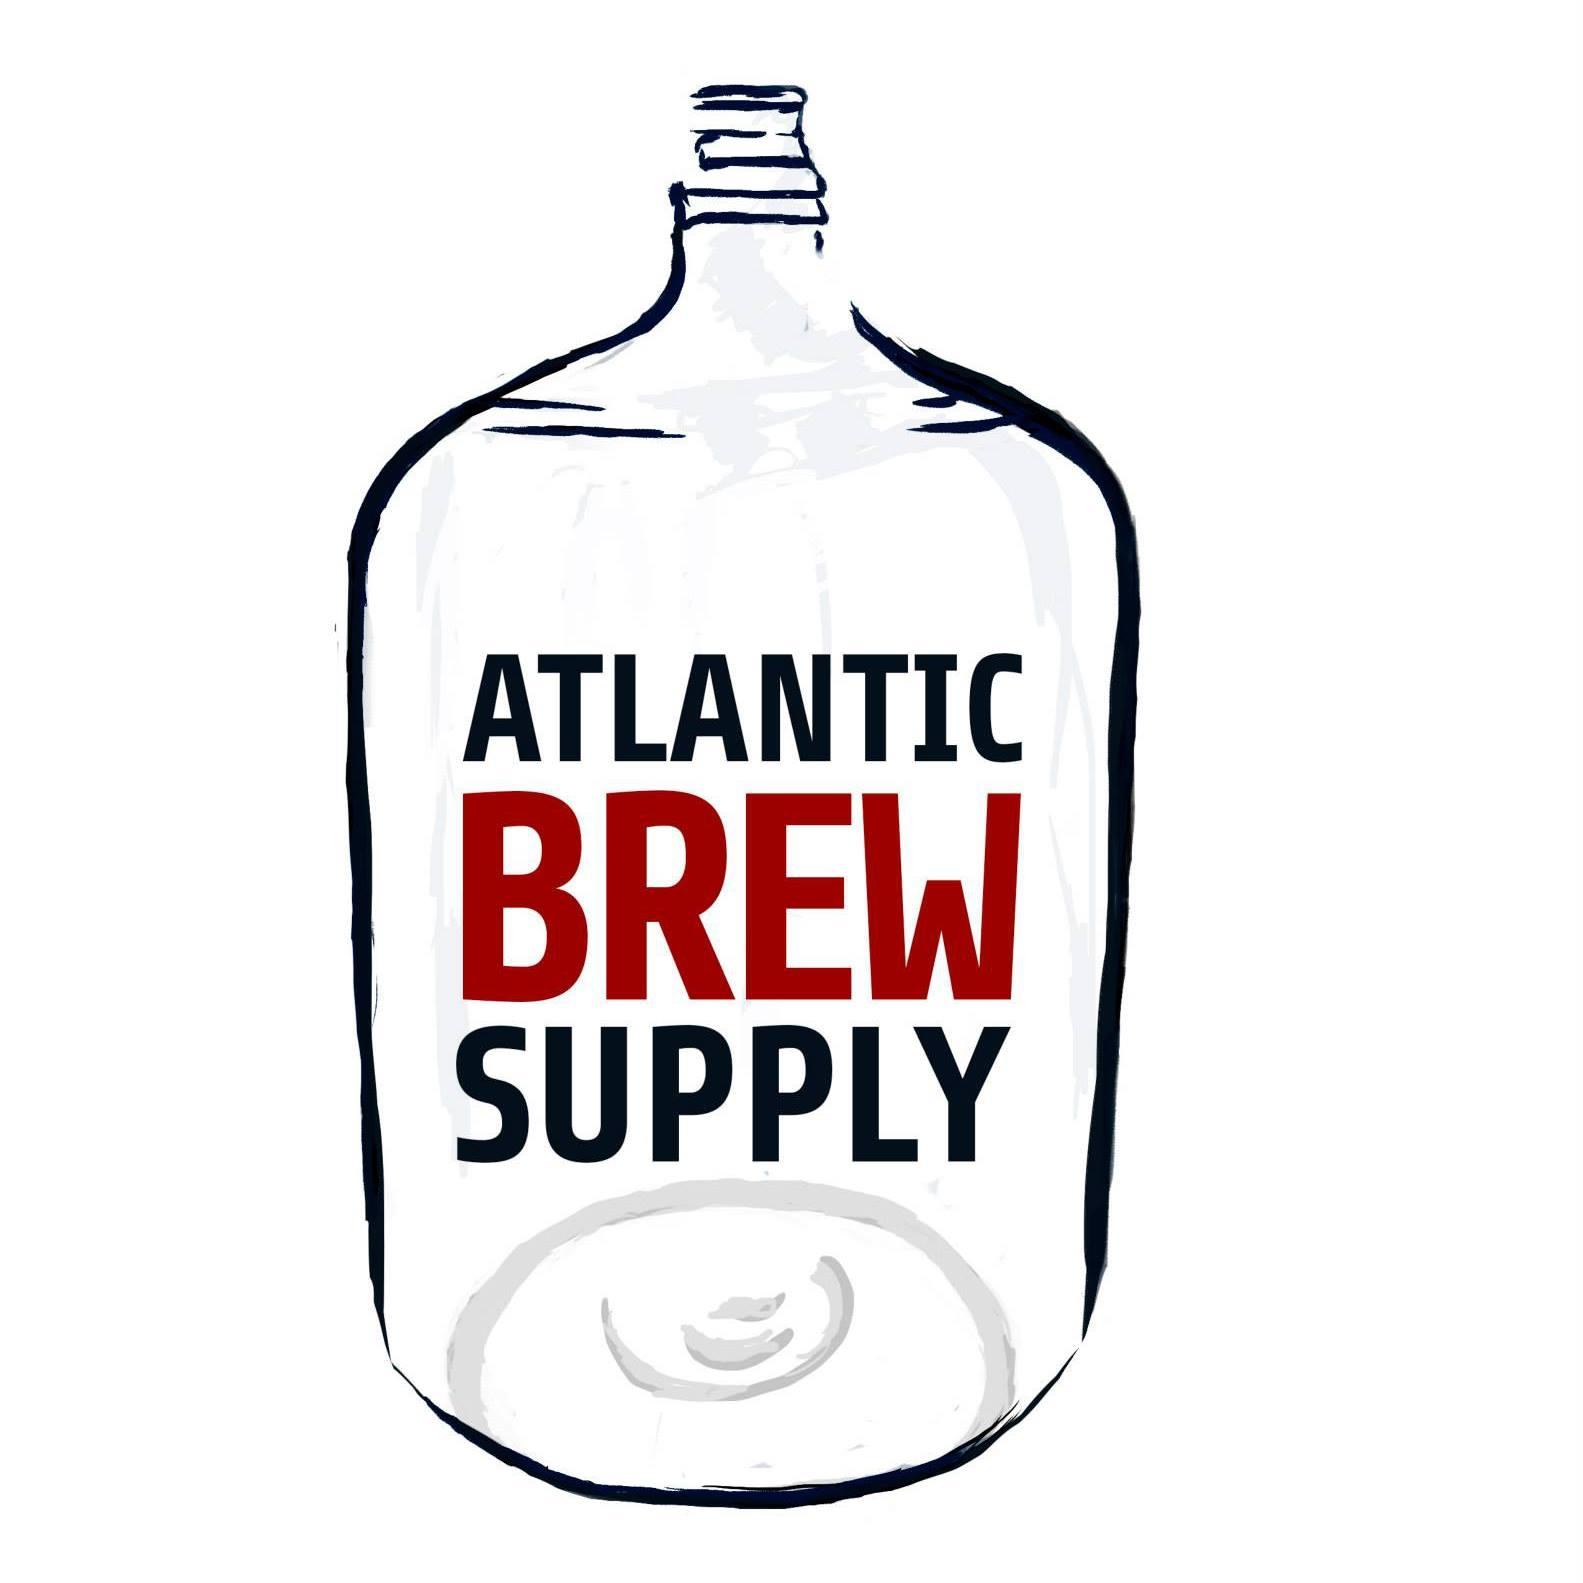 Atlantic Brew Supply.jpg